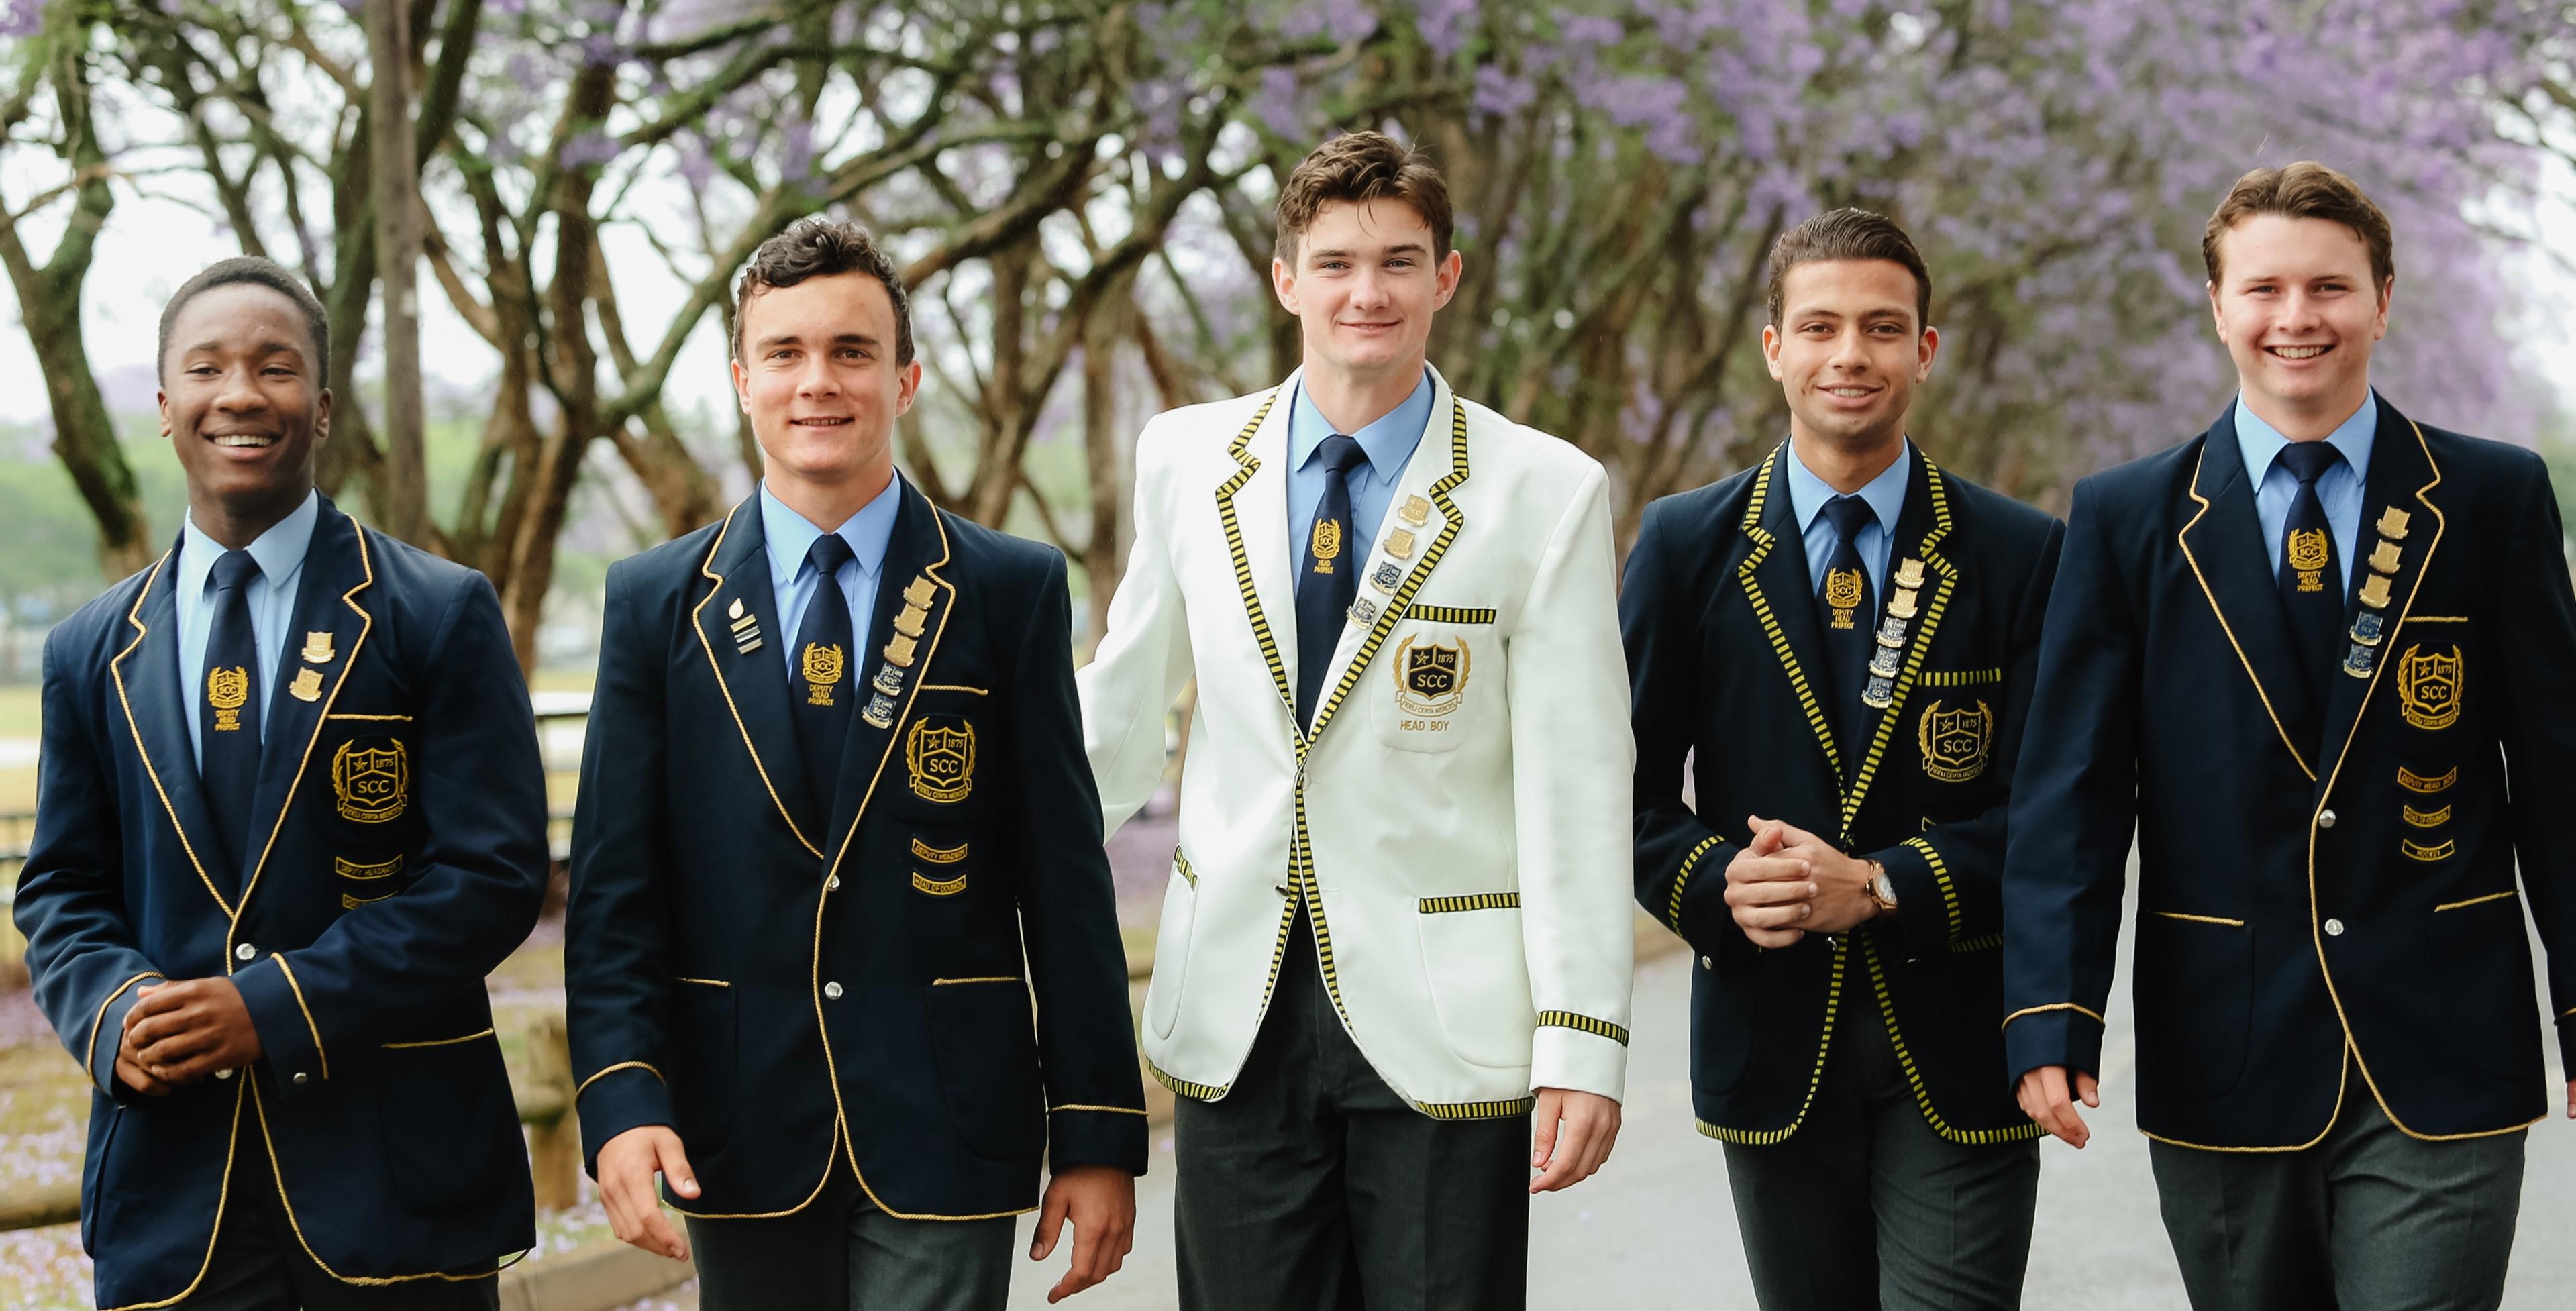 private boys high school